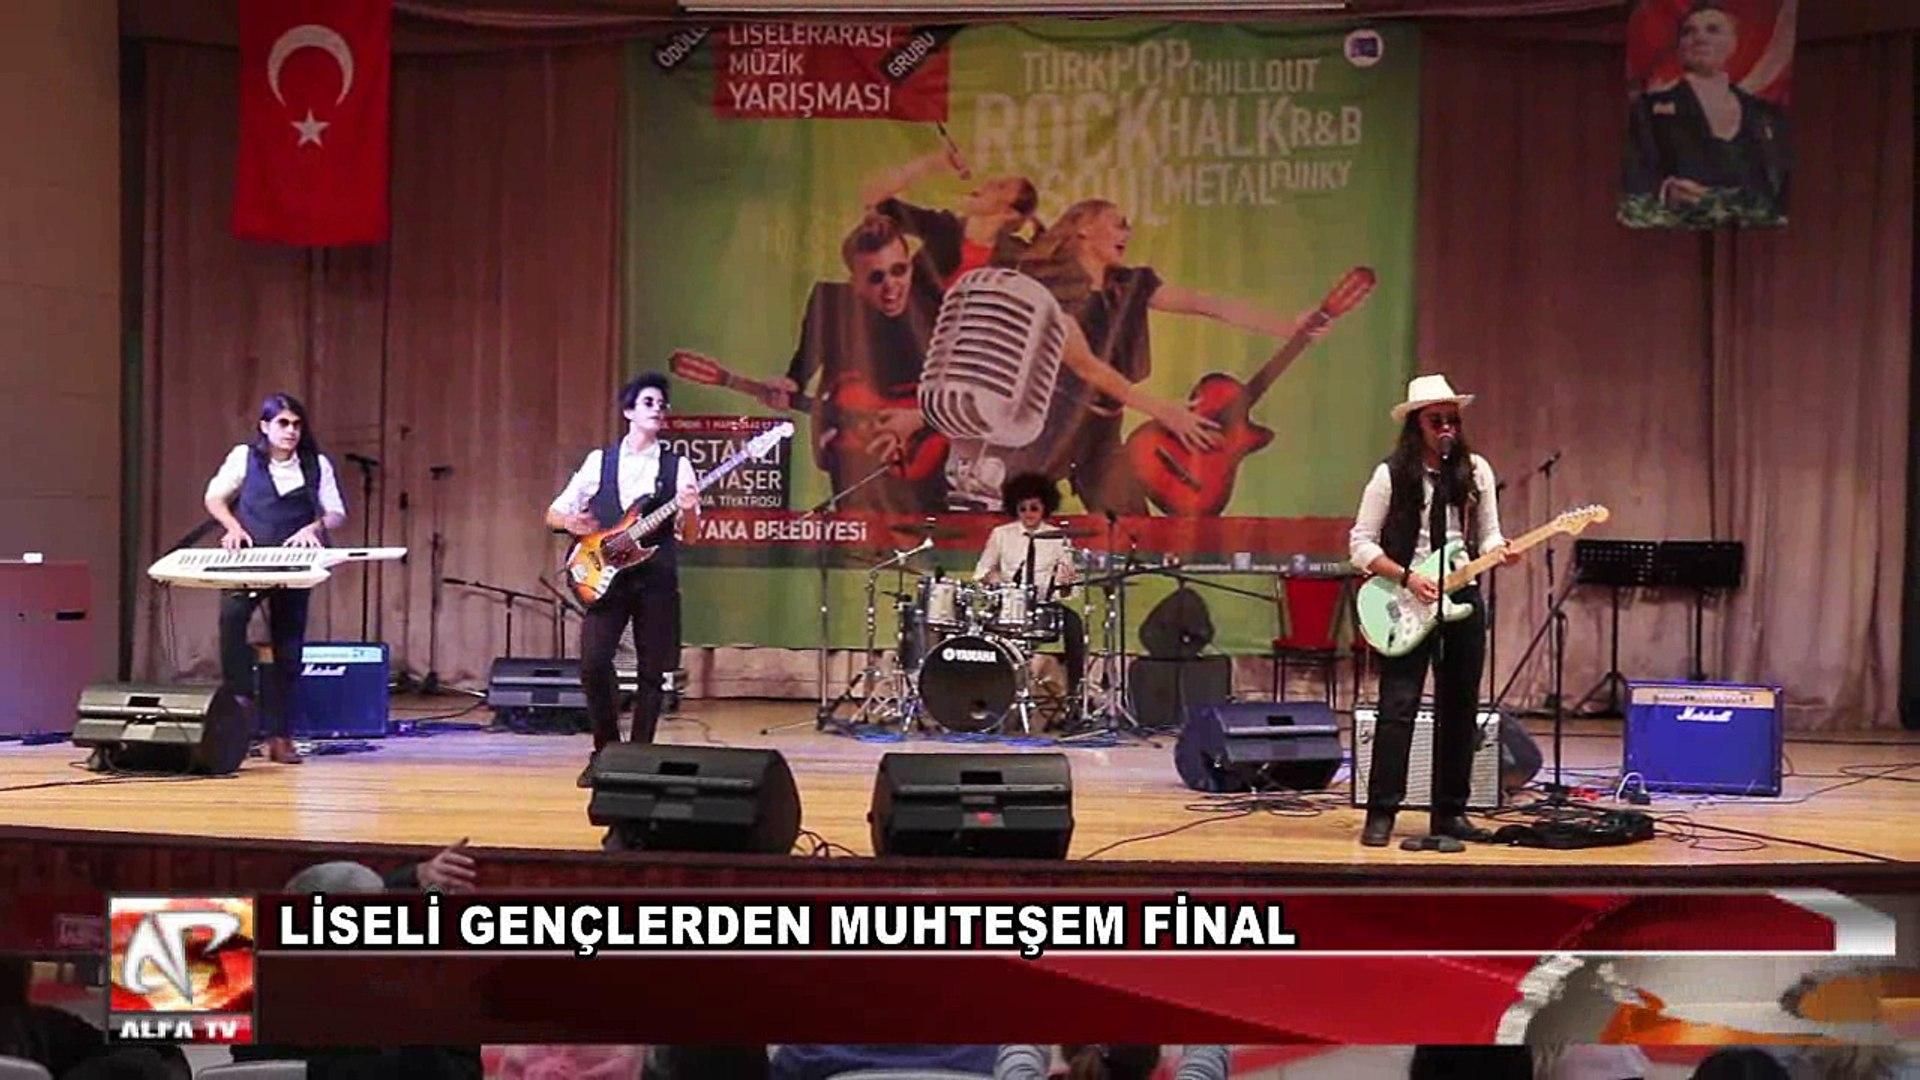 Liseli Gençlerden Muhteşem Final